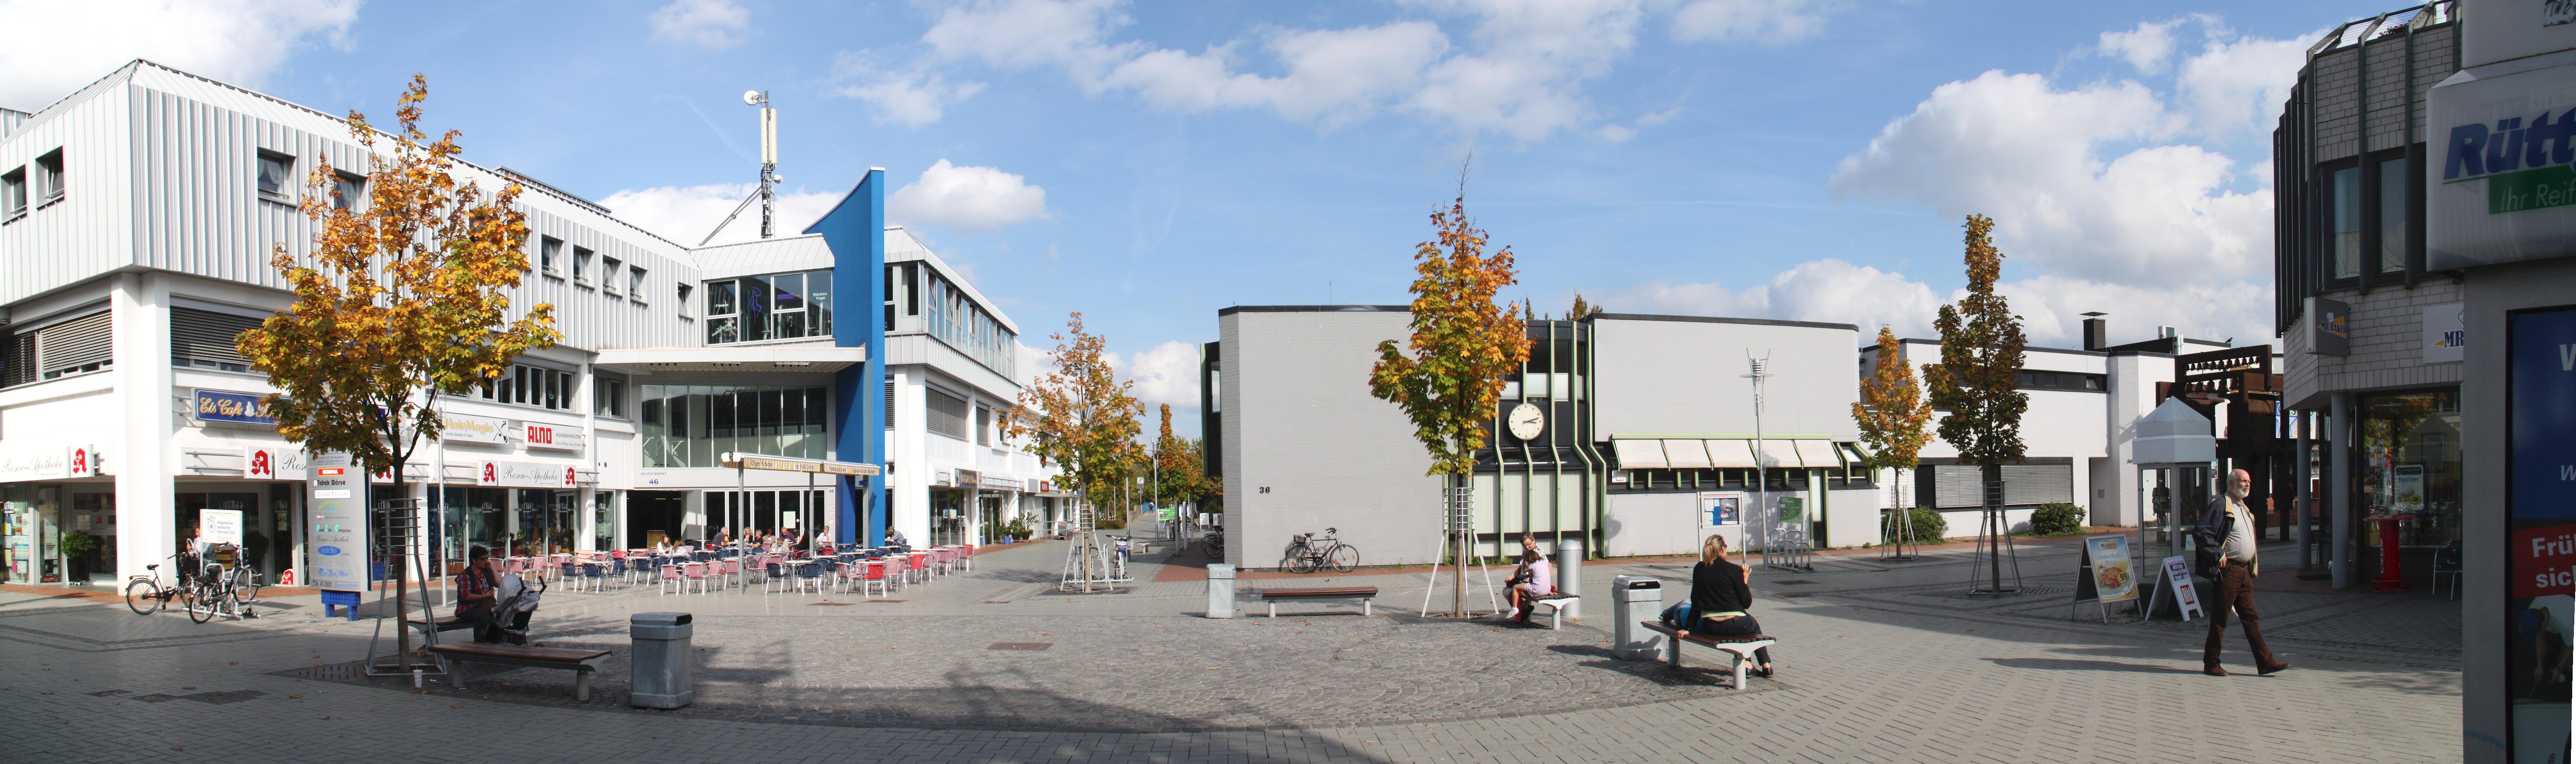 Meckenheim (Rheinland)